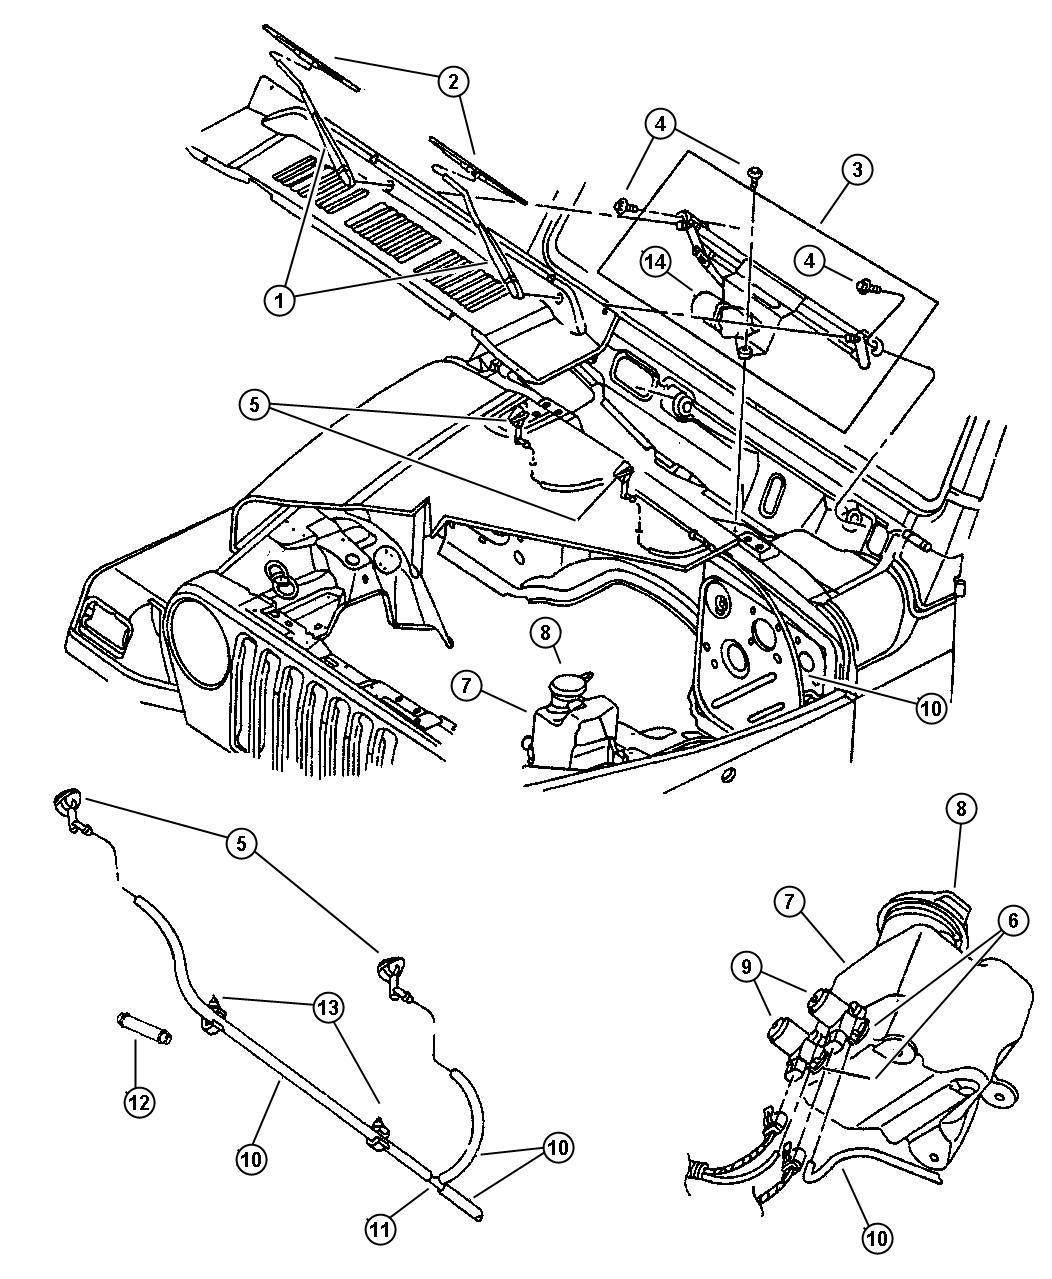 1998 Jeep Wrangler Wiper System.